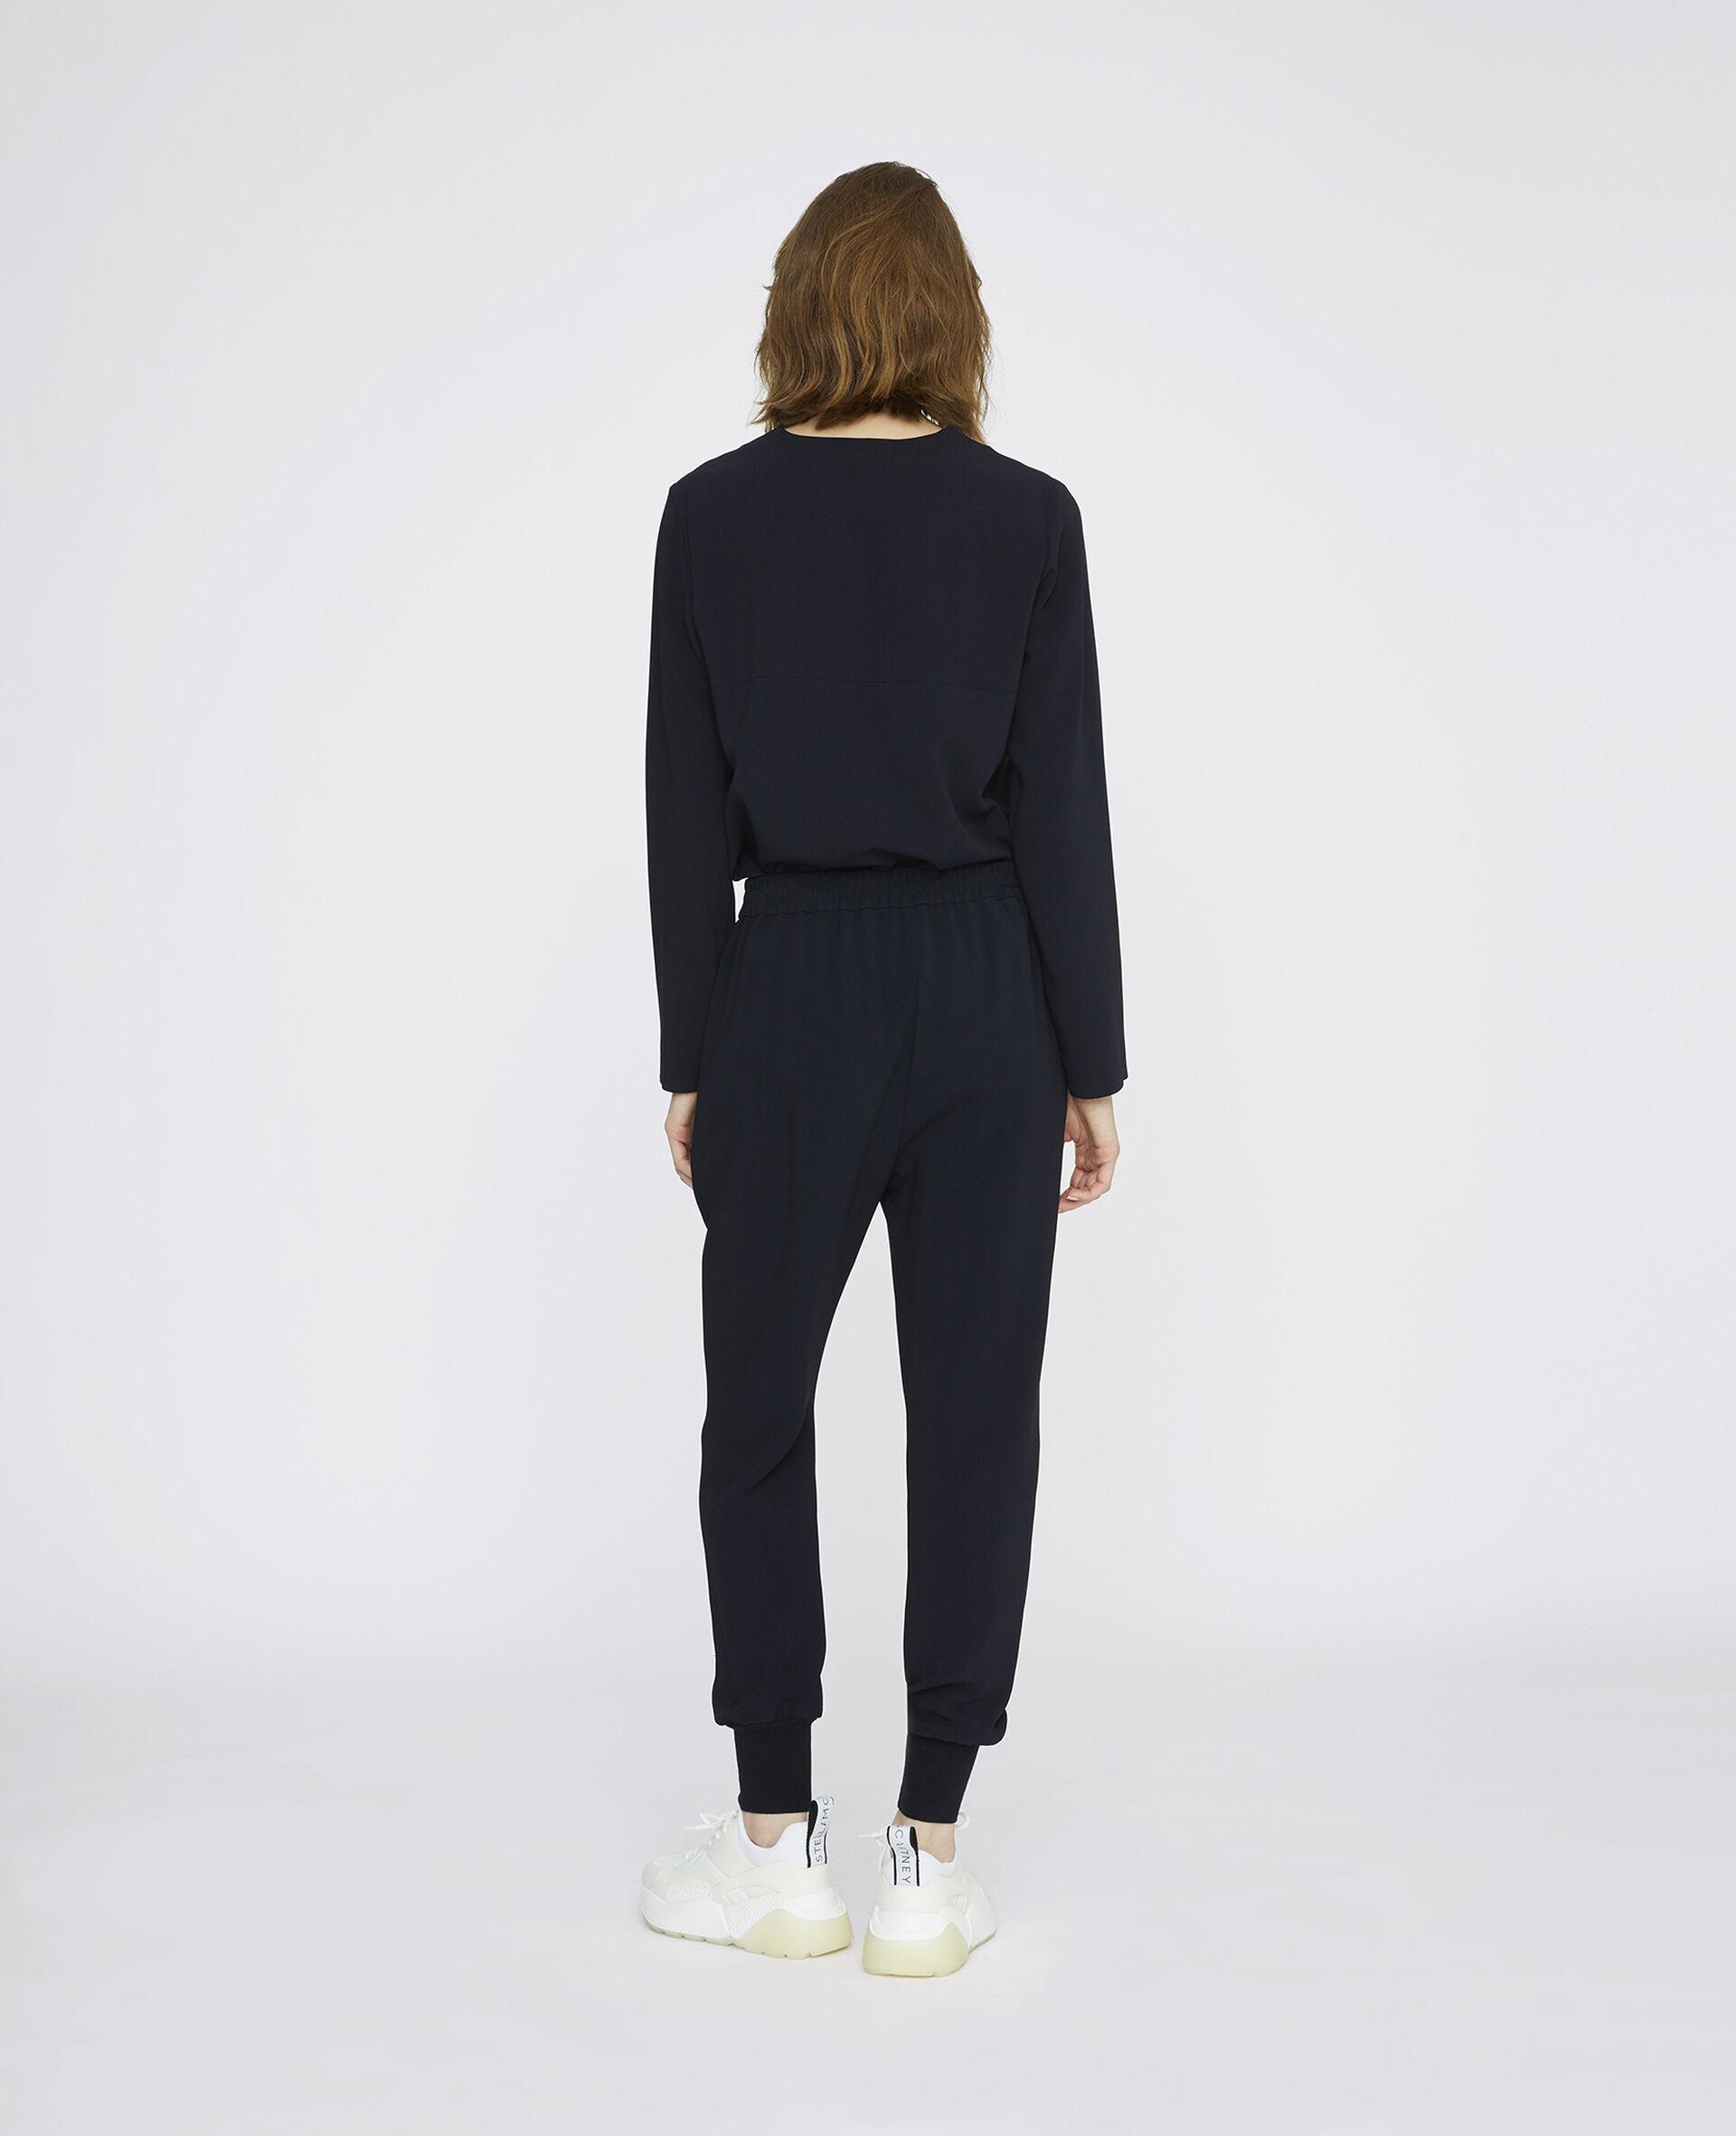 Arlesa 上衣-黑色-large image number 2